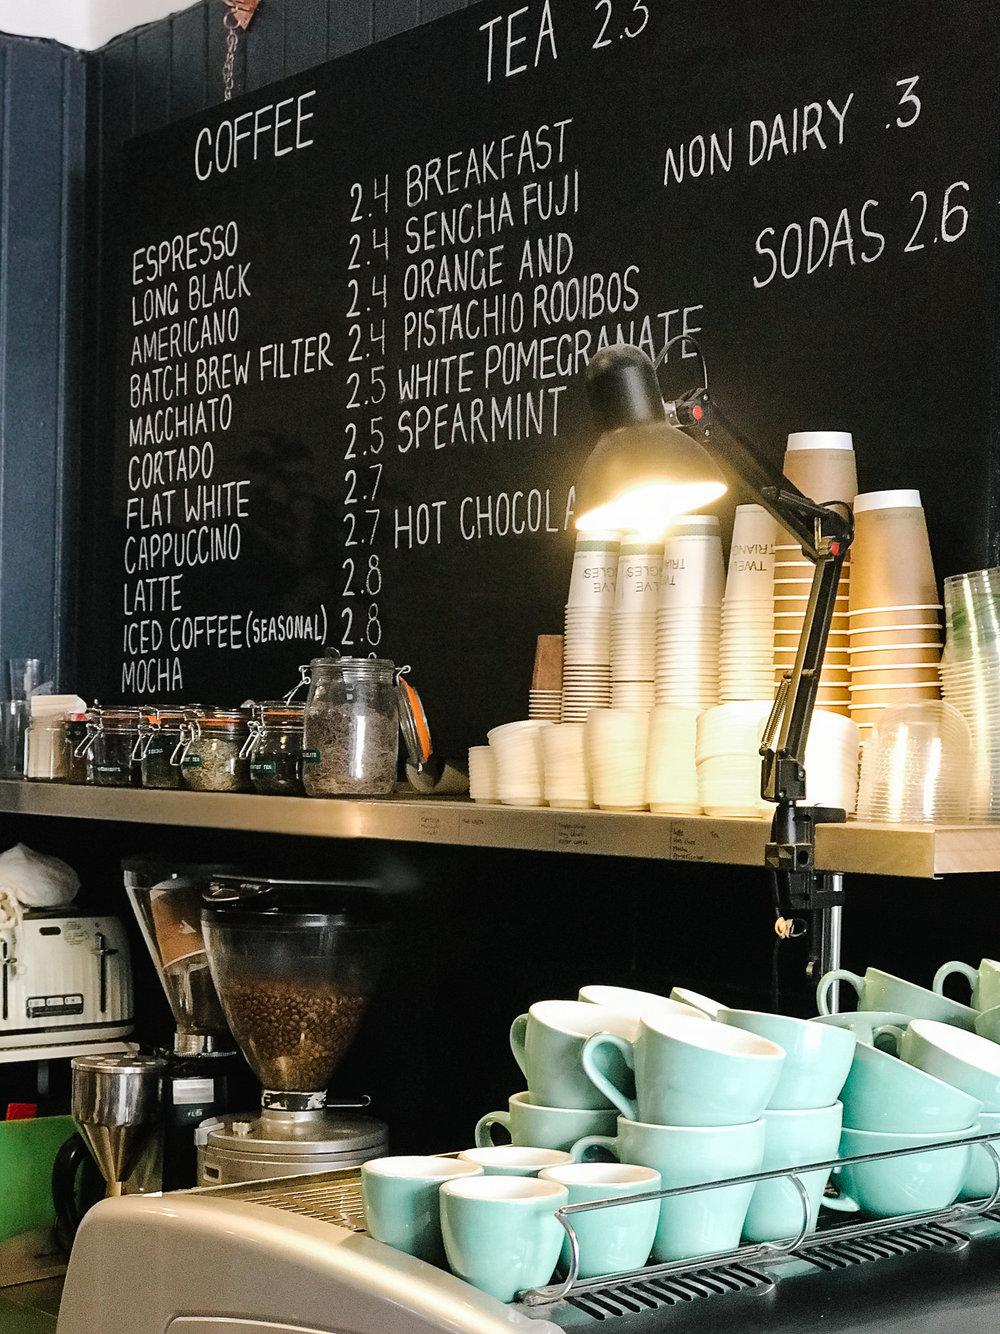 Twelve Triangles bakery Edinburgh serves excellent coffee